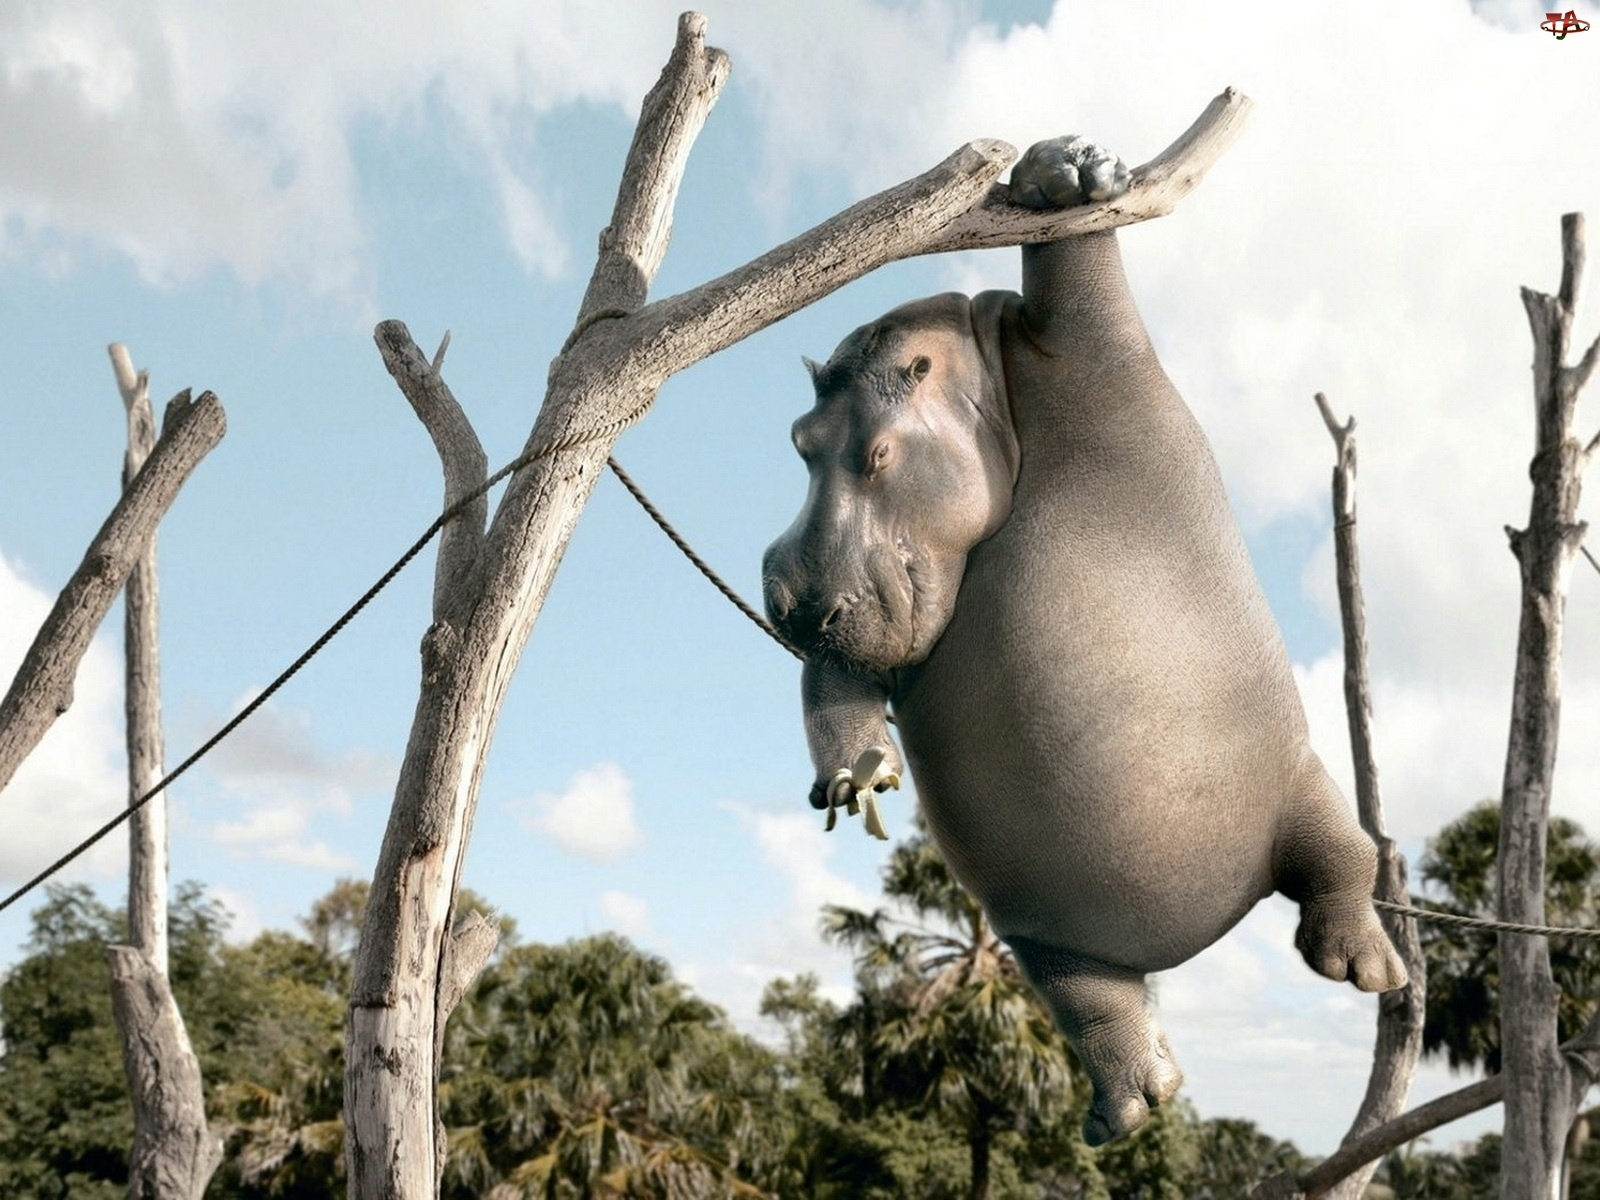 Hipopotam, Banan, Na, Drzewie